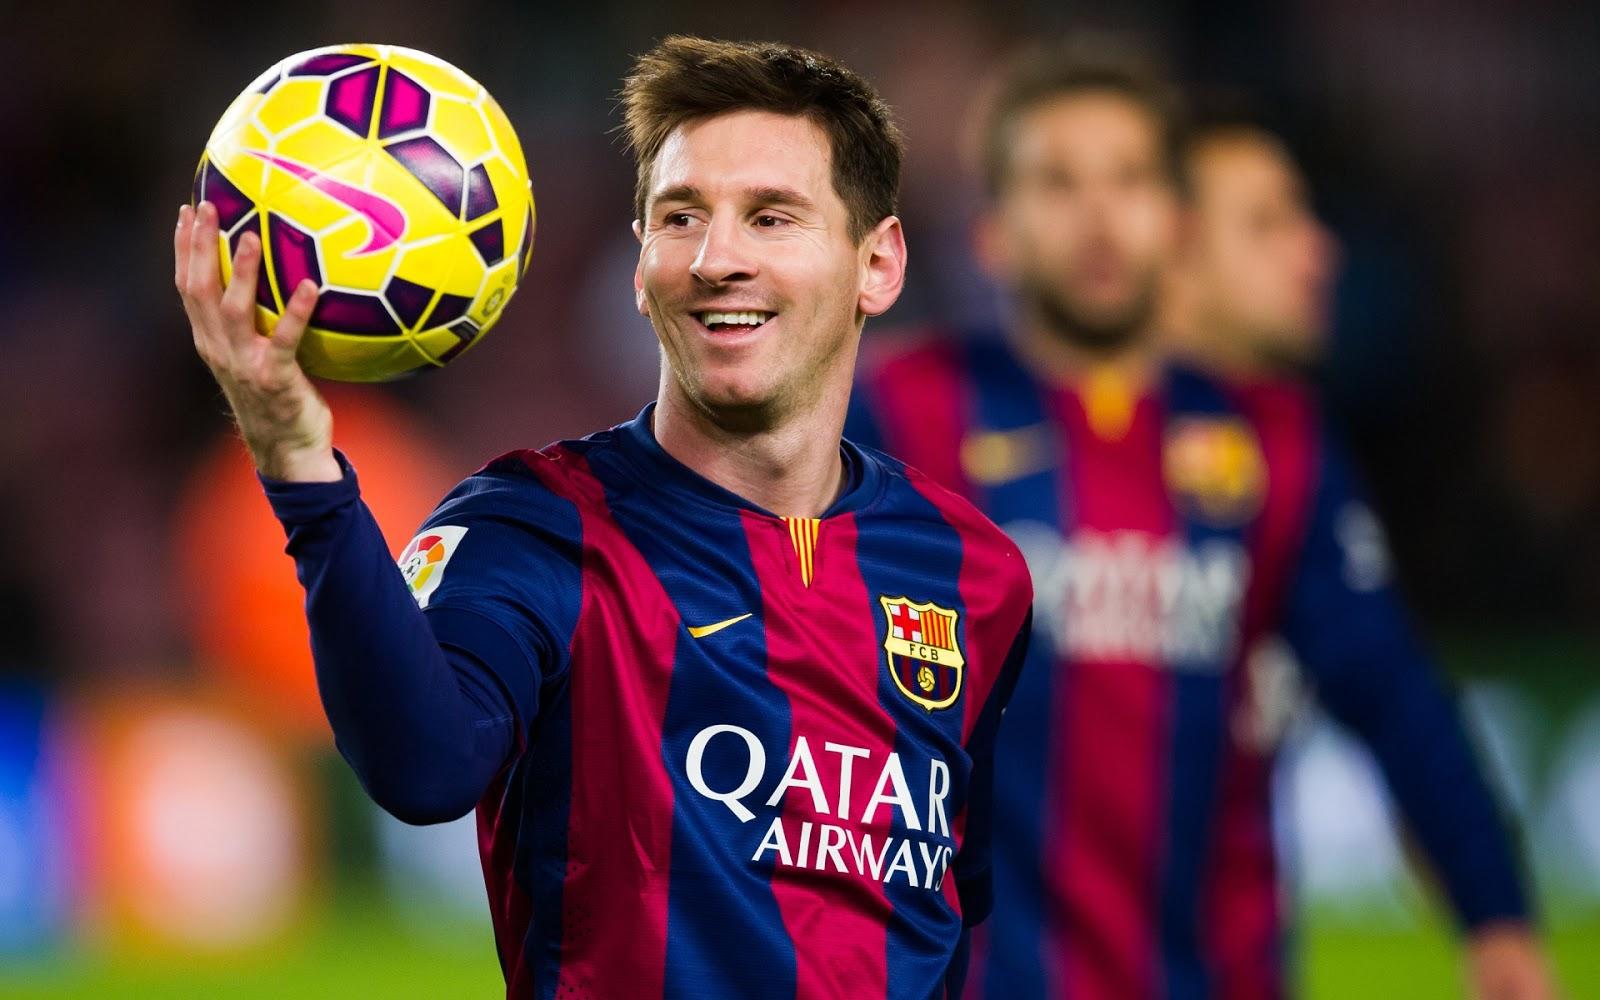 Hinh-anh-dep-nhat-cua-Lionel-Messi-%25283